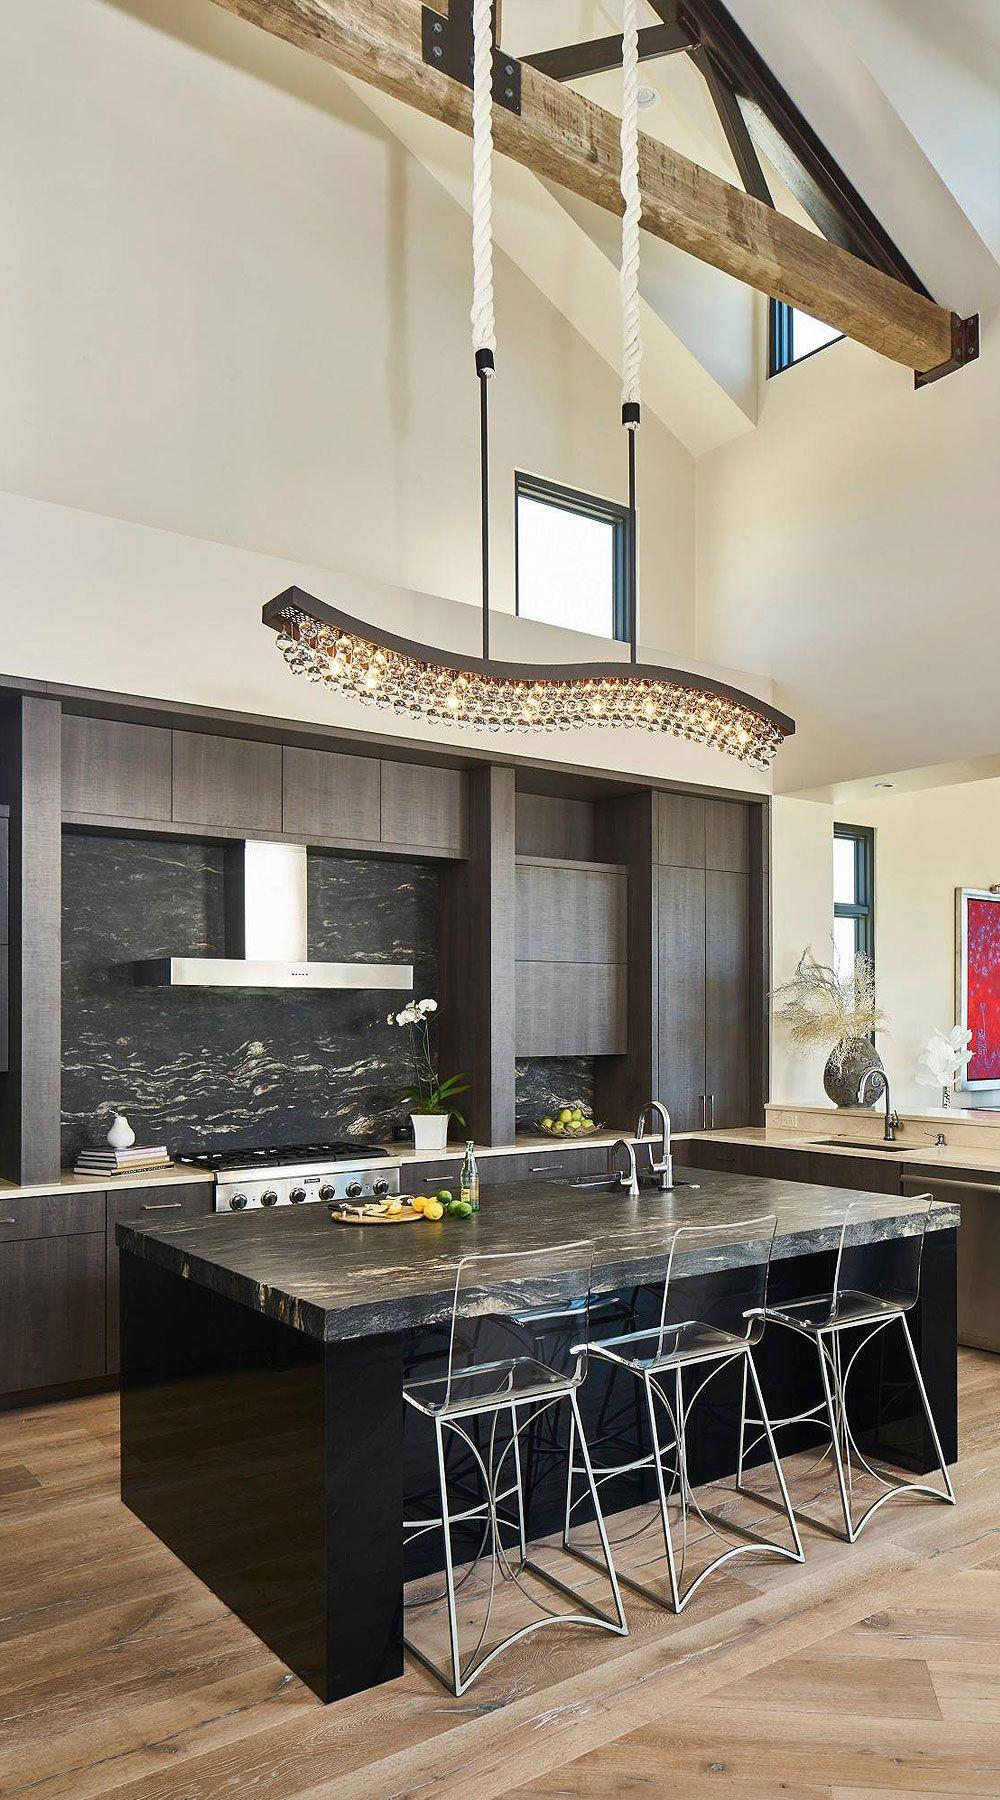 50+ Black Countertop Backsplash Ideas (Tile Designs, Tips ... on Backsplash Ideas For Dark Granite Countertops  id=44988